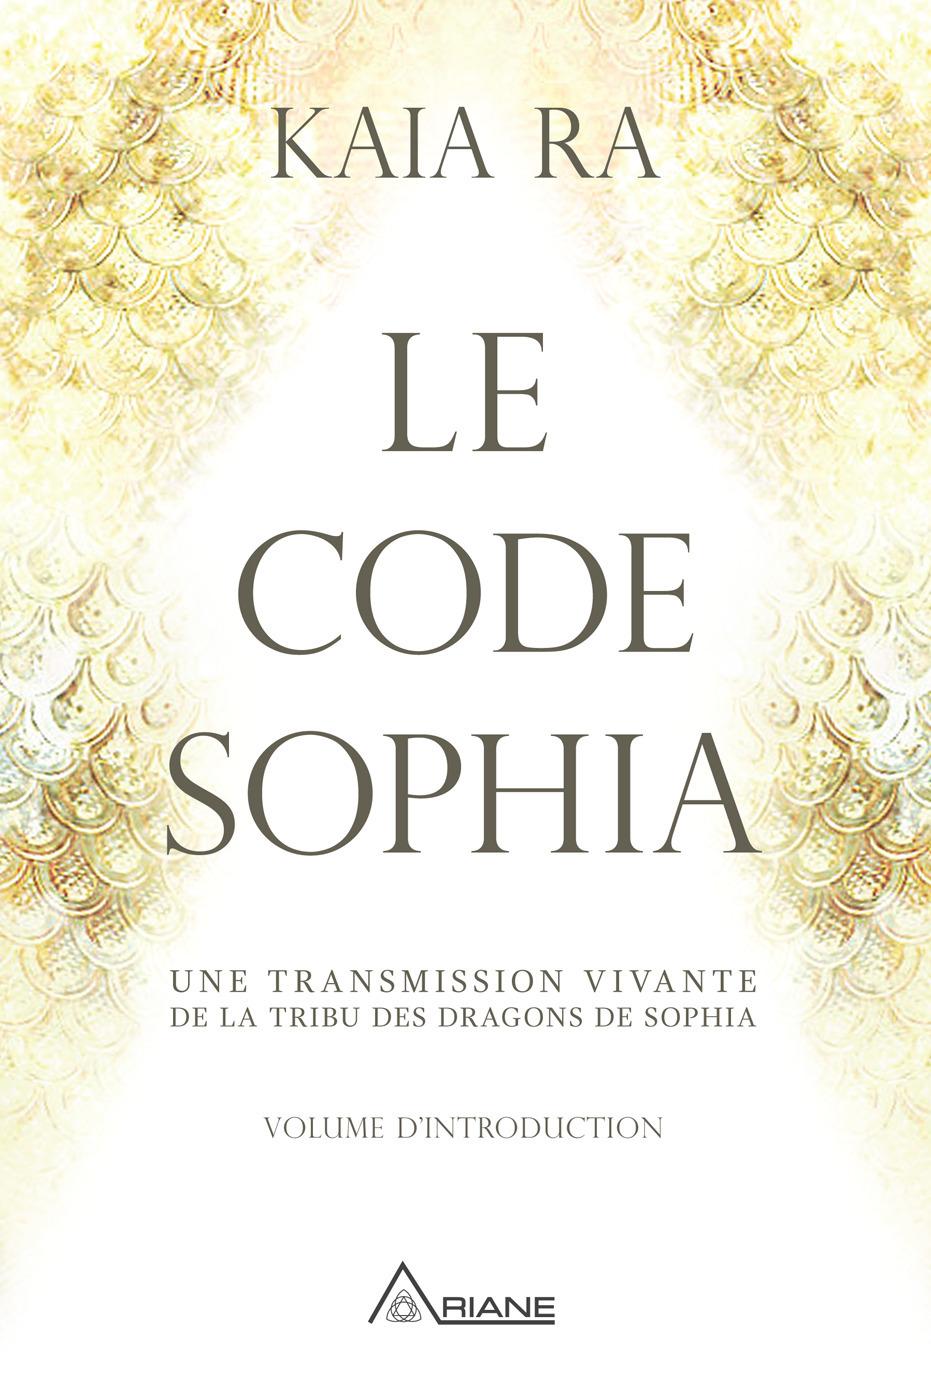 Le code Sophia ; une transmission vivante de la tribu des dragons de Sophia